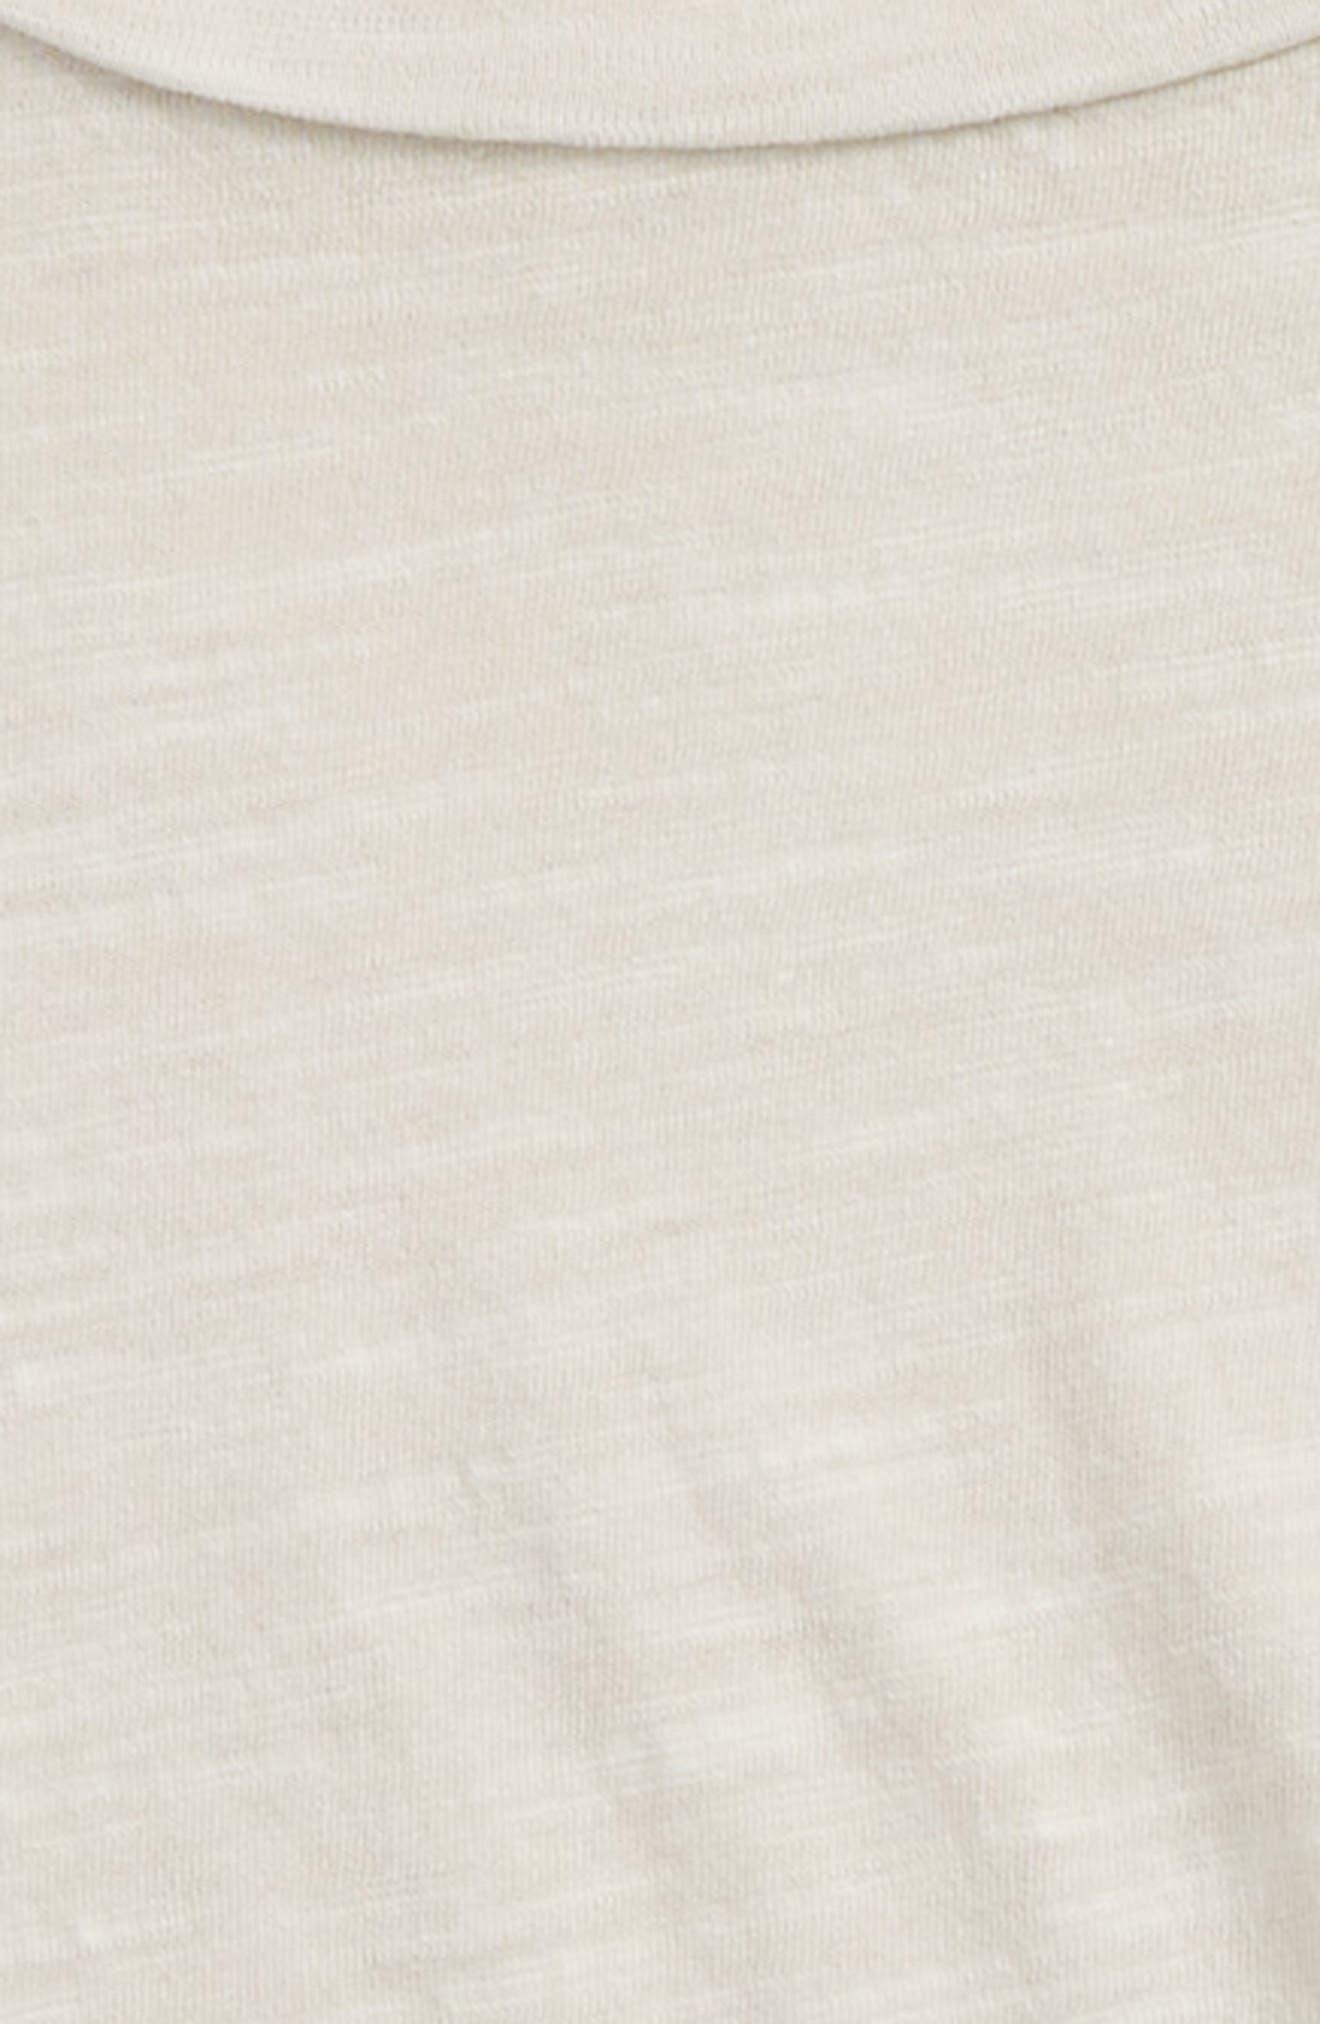 Short Sleeve Cotton T-Shirt,                             Alternate thumbnail 2, color,                             Grey Lunar